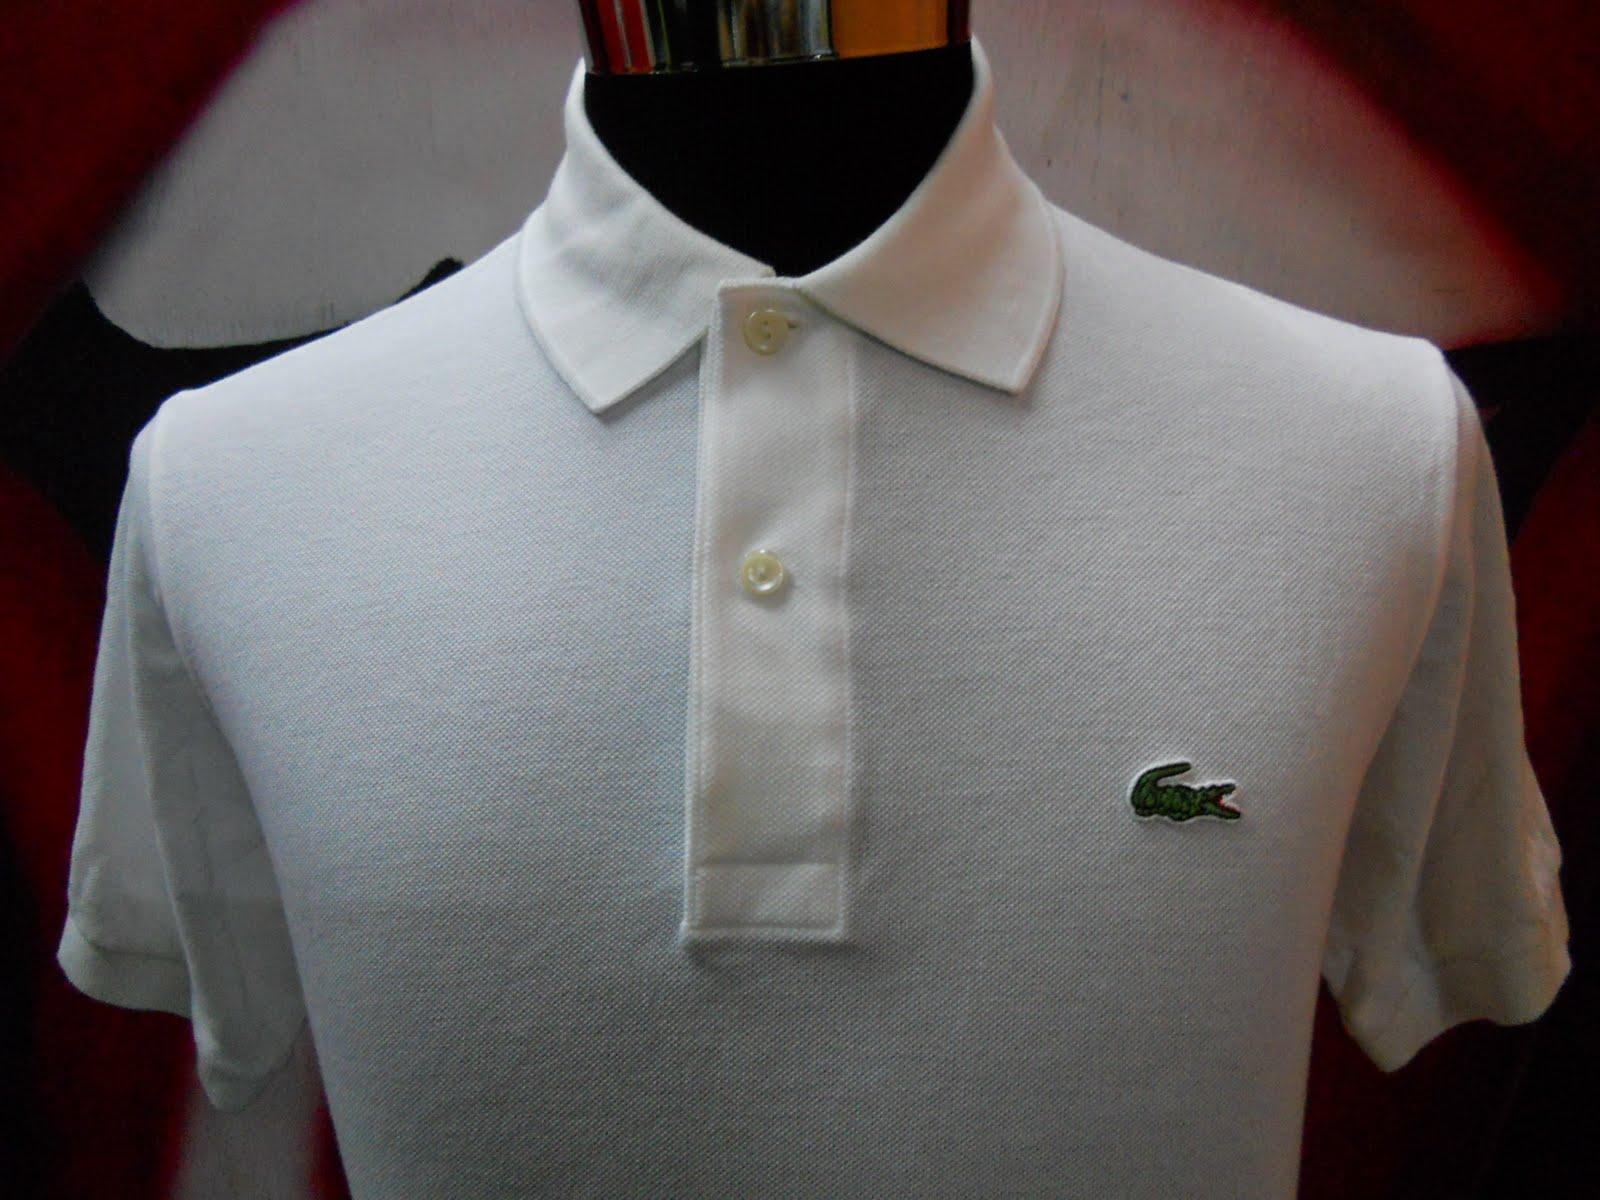 Trend Bundle March 2011 Tendencies Tshirt Japan Soda Hitam Xl Lacoste Shirtmade In